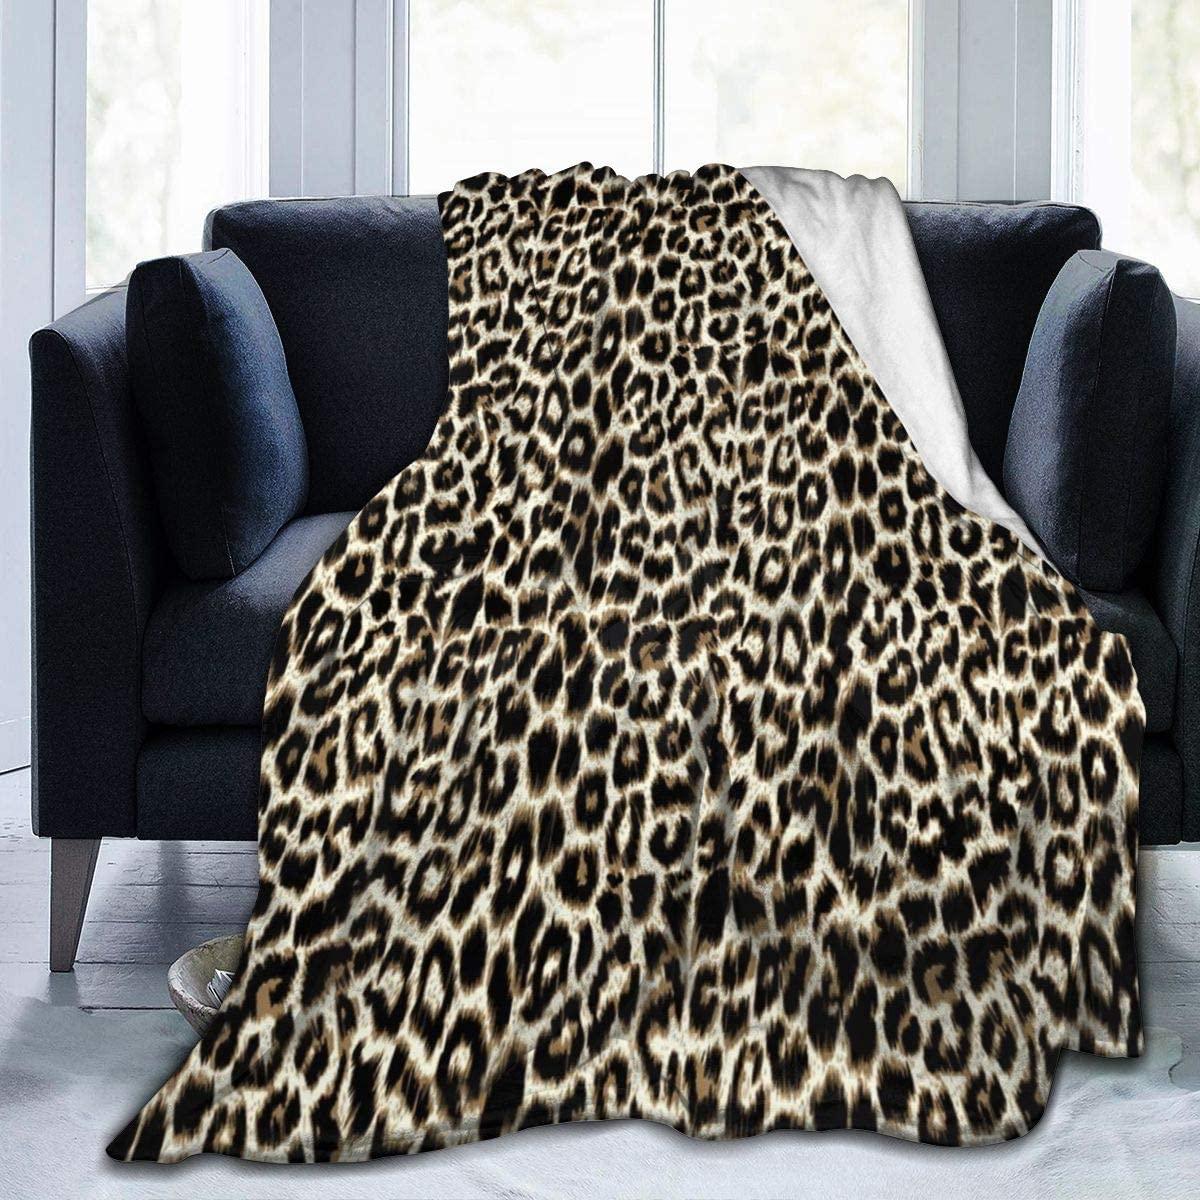 Micro Fleece Plush Soft Baby Blanket Unique Leopard Print Fluffy Warm Toddler Bed/Crib Blanket Lightweight Flannel Daycare Nap Kids Sleeping Tummy Time Throw Blanket Girls Boy Clearance Kid/Baby